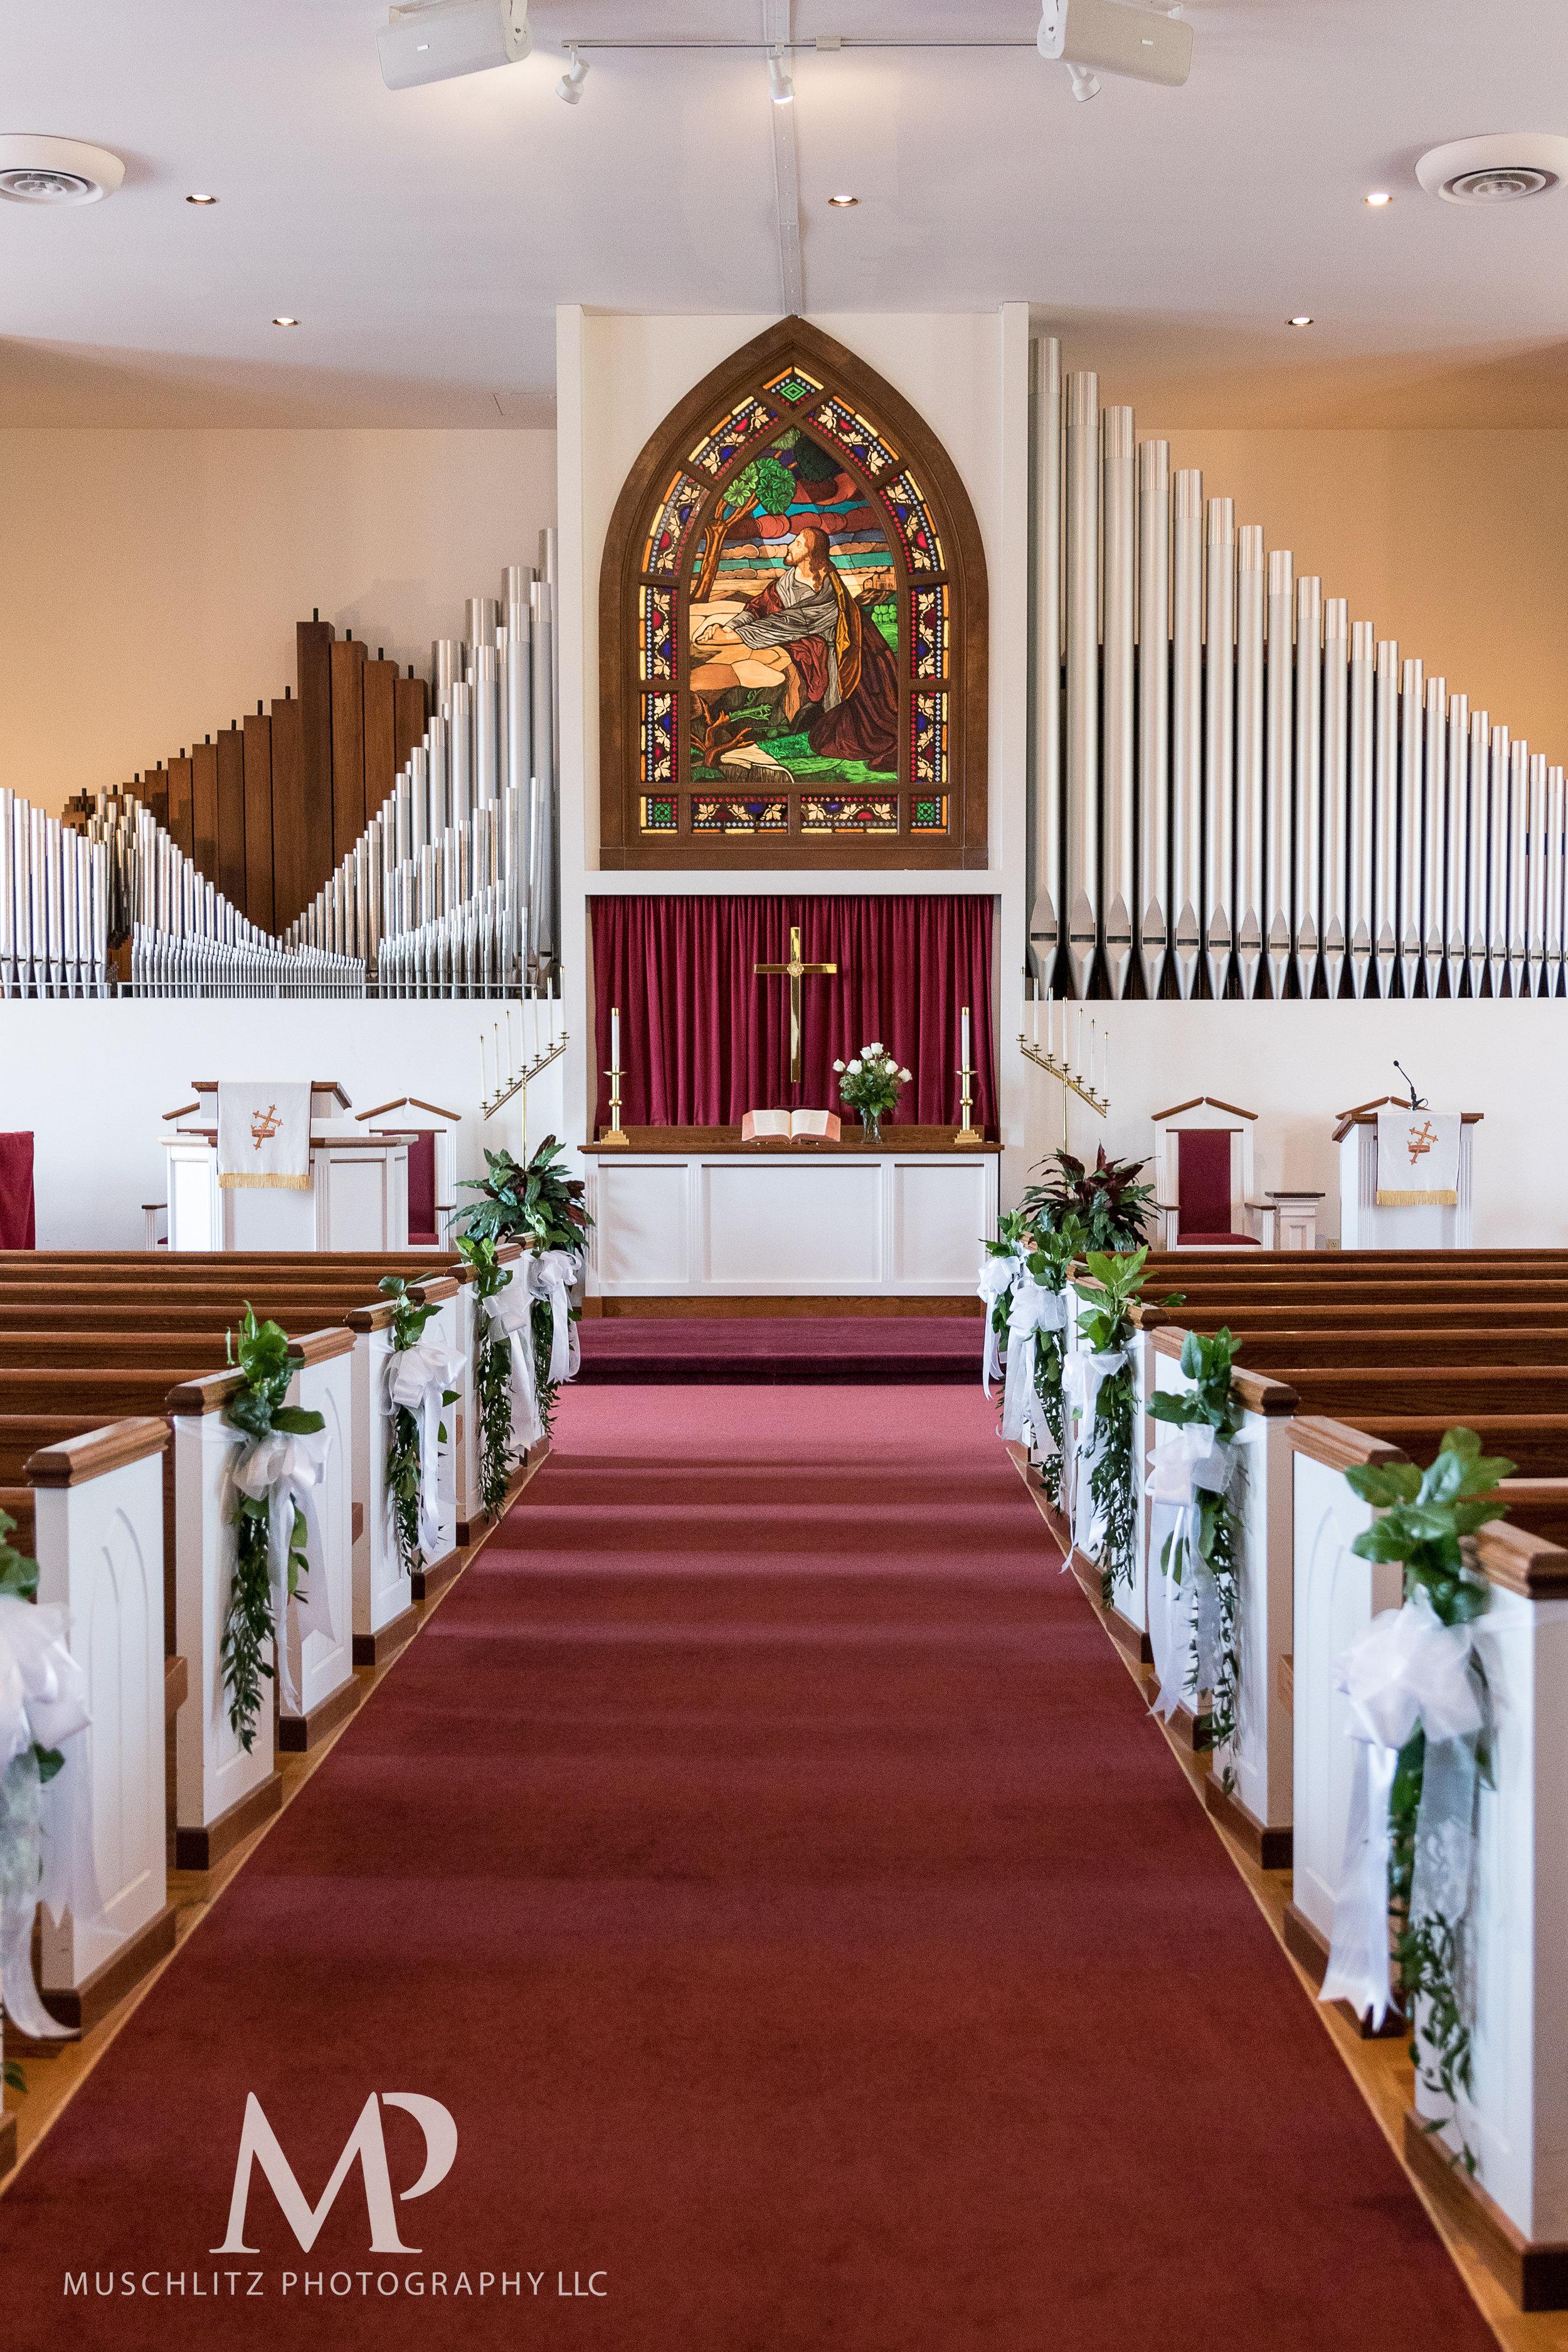 dublin-community-church-wedding-columbus-ohio-muschlitz-photography-005.JPG